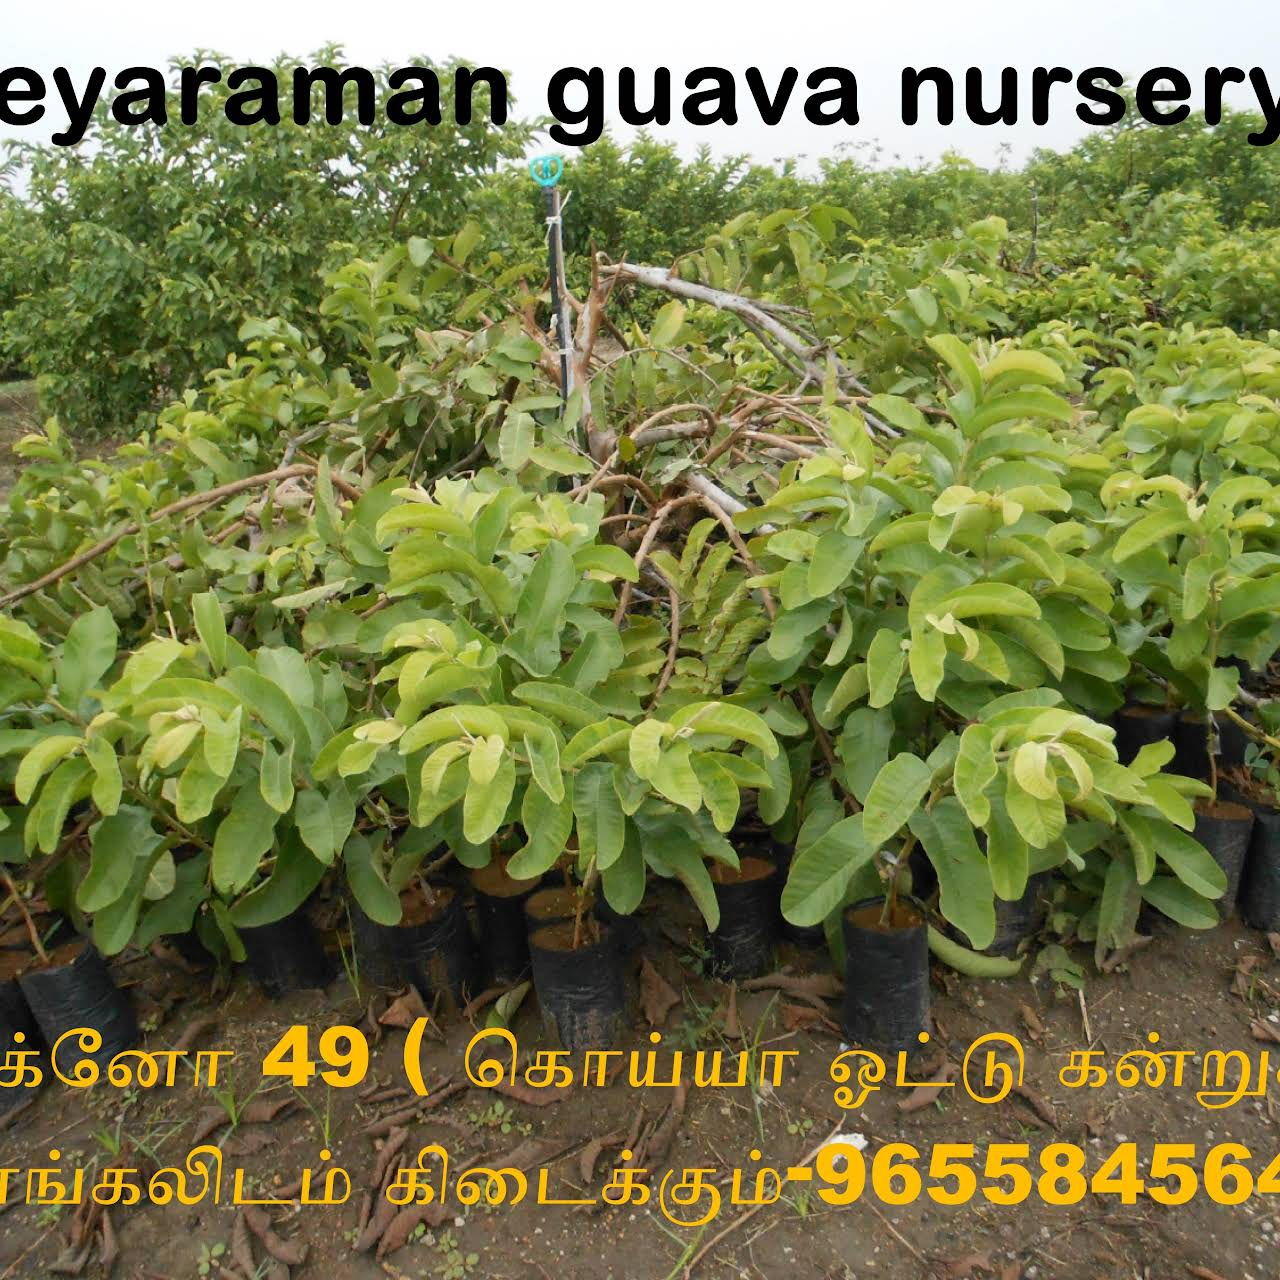 jeyaraman guava plants nursery(available Varieties